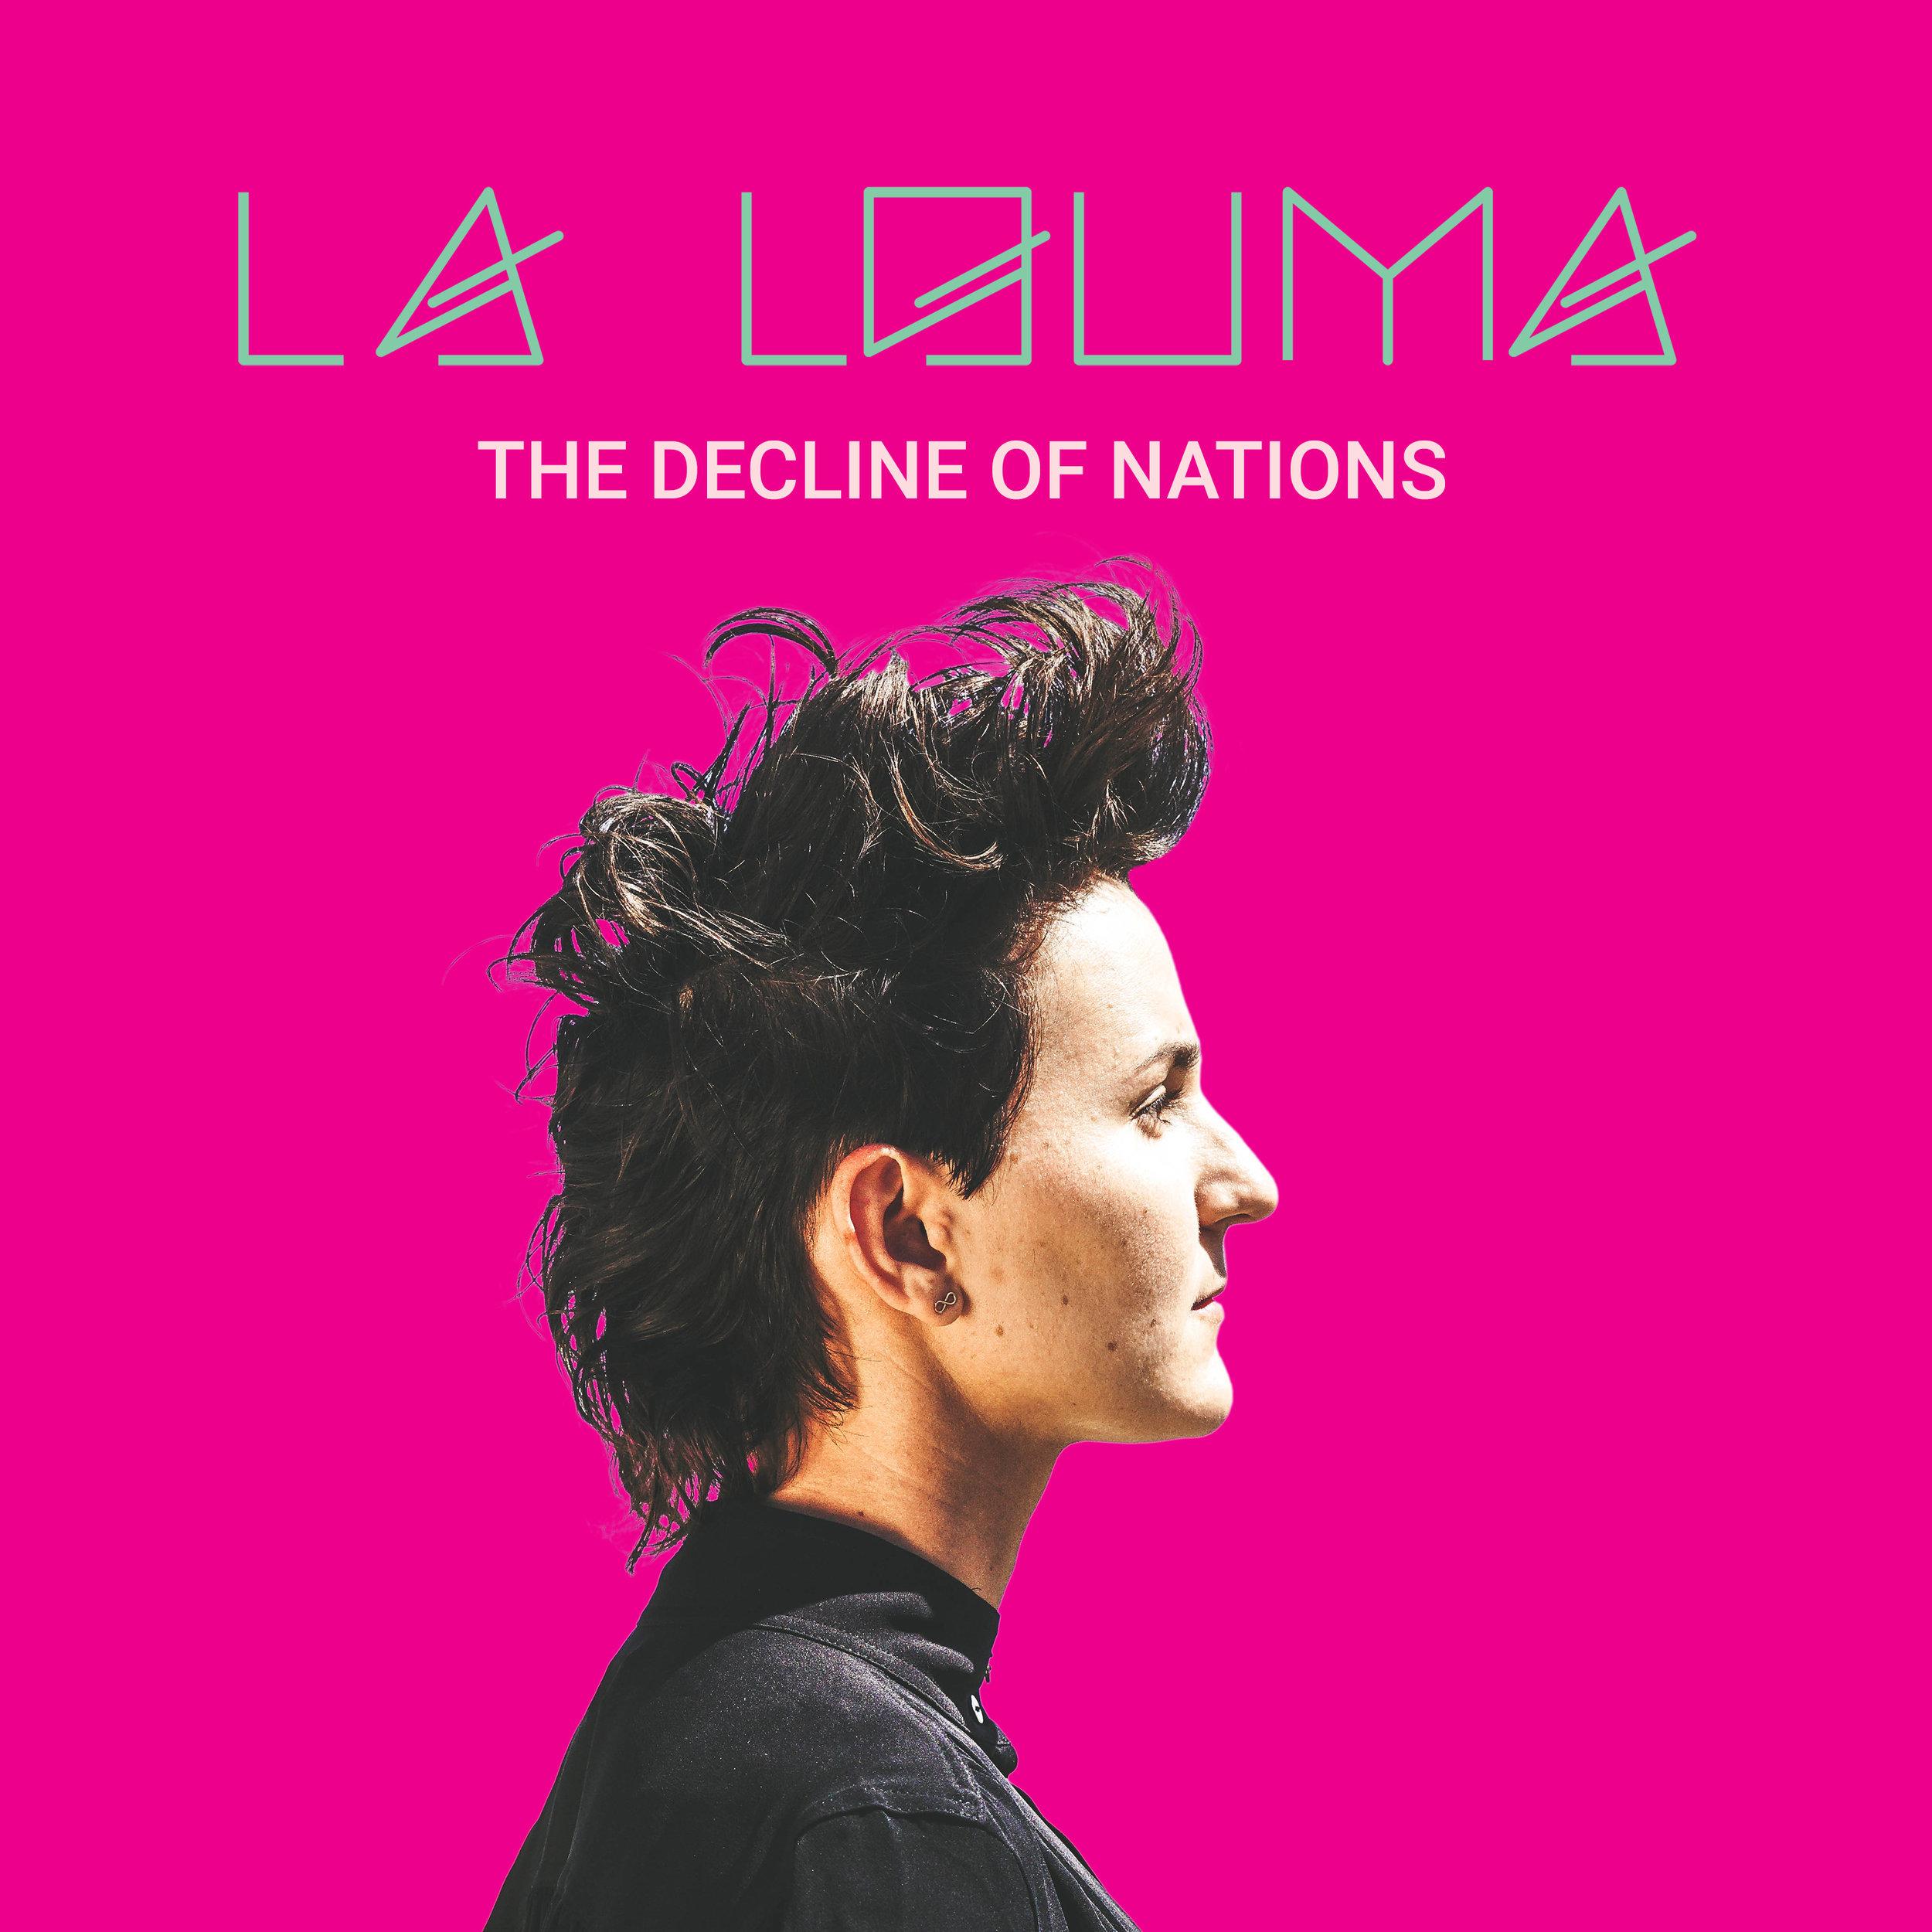 La Louma - The Decline Of Nations - Single Artwork.jpg